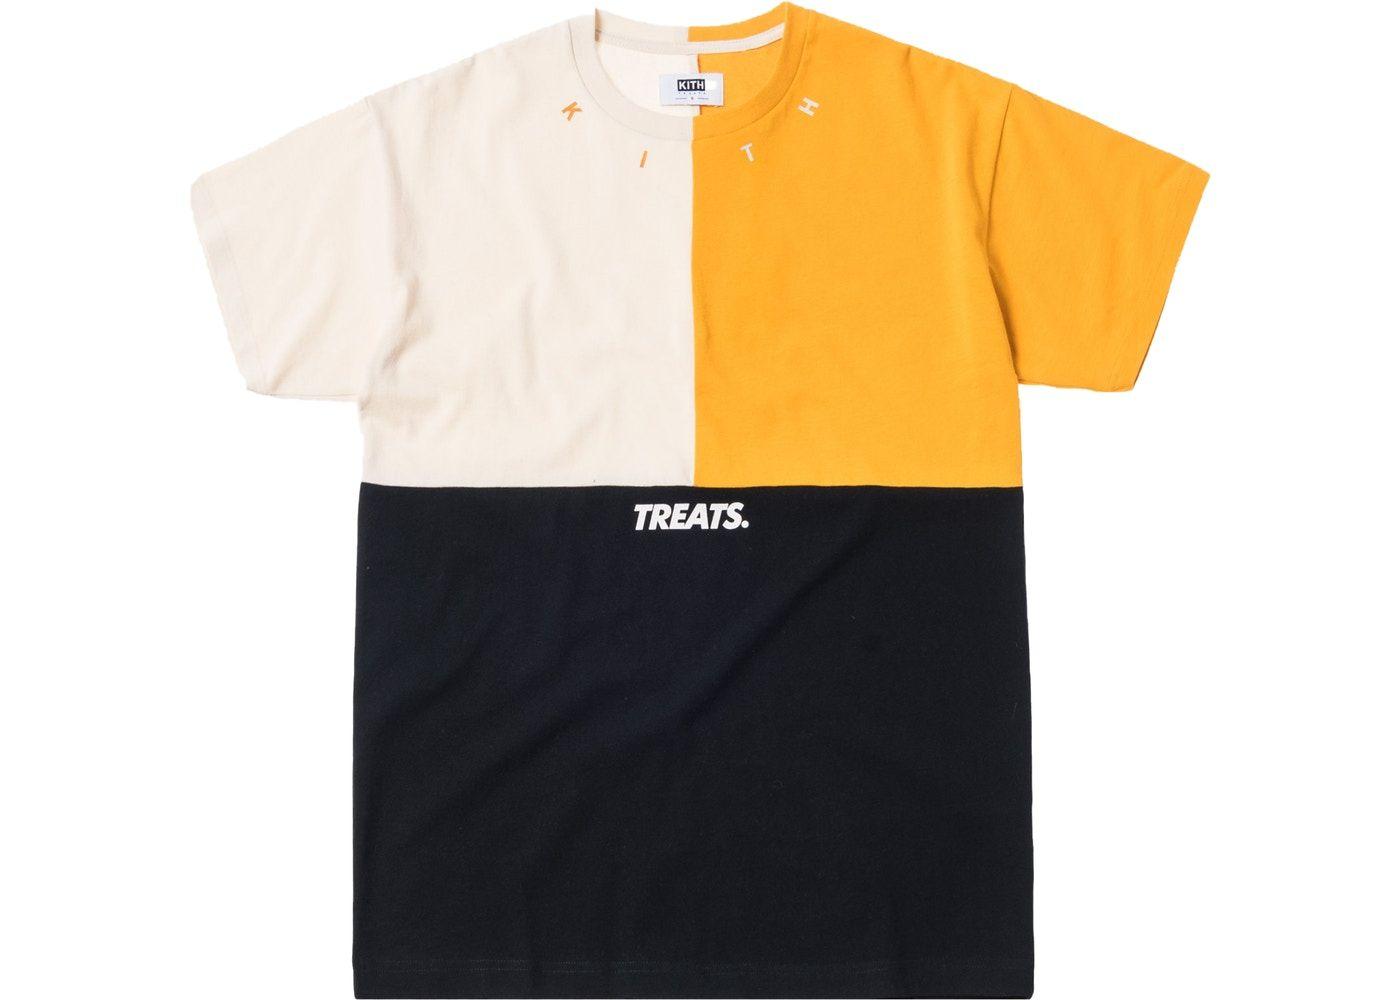 b80911bf Kith Treats Triblock Tee Black | Liste de noël | Mens tops, Polo, Shirts